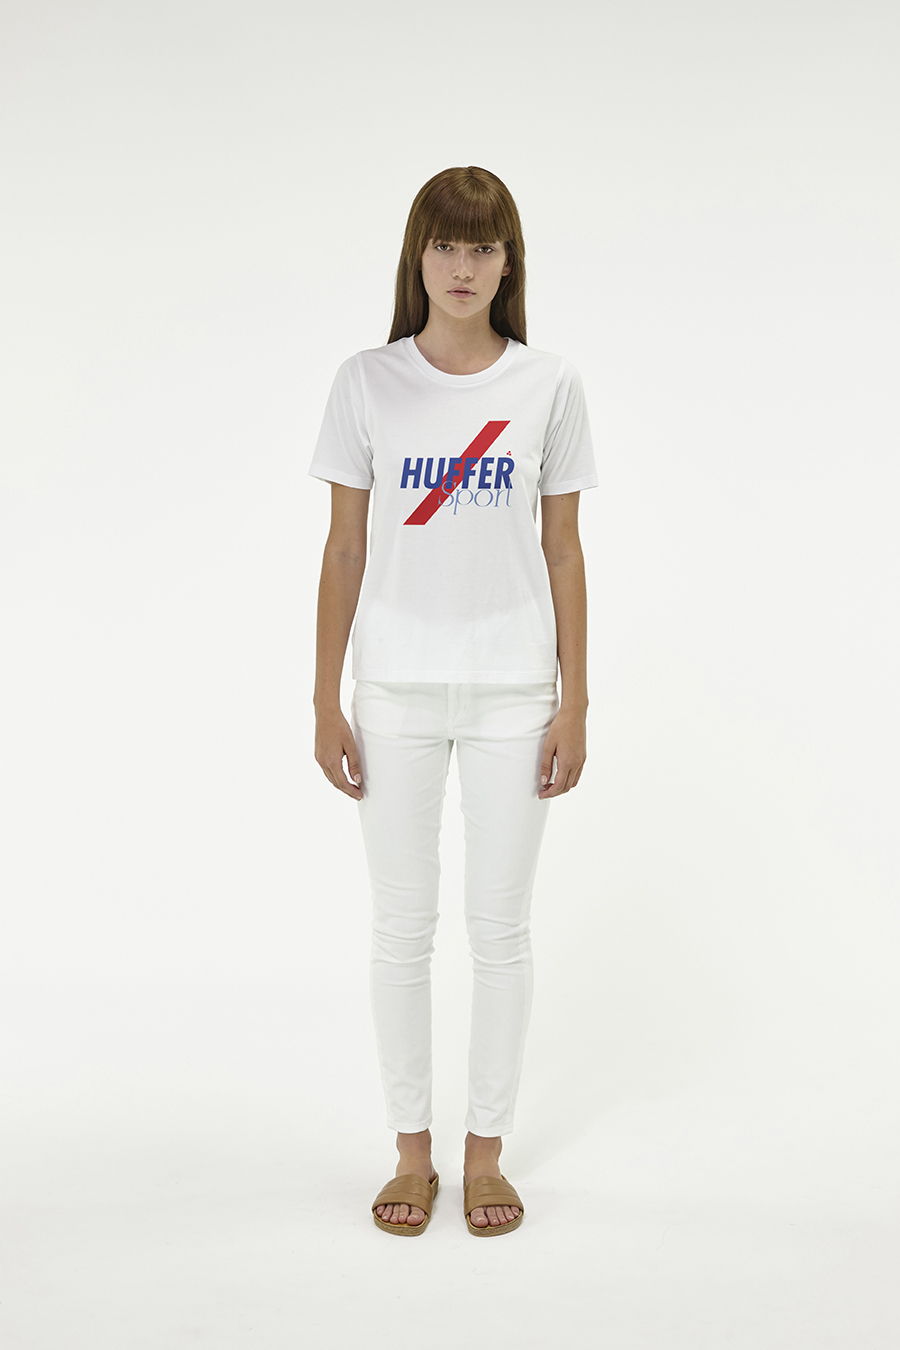 Huffer_Q3-16_W-Stella-Tee-STRIKE_White-01